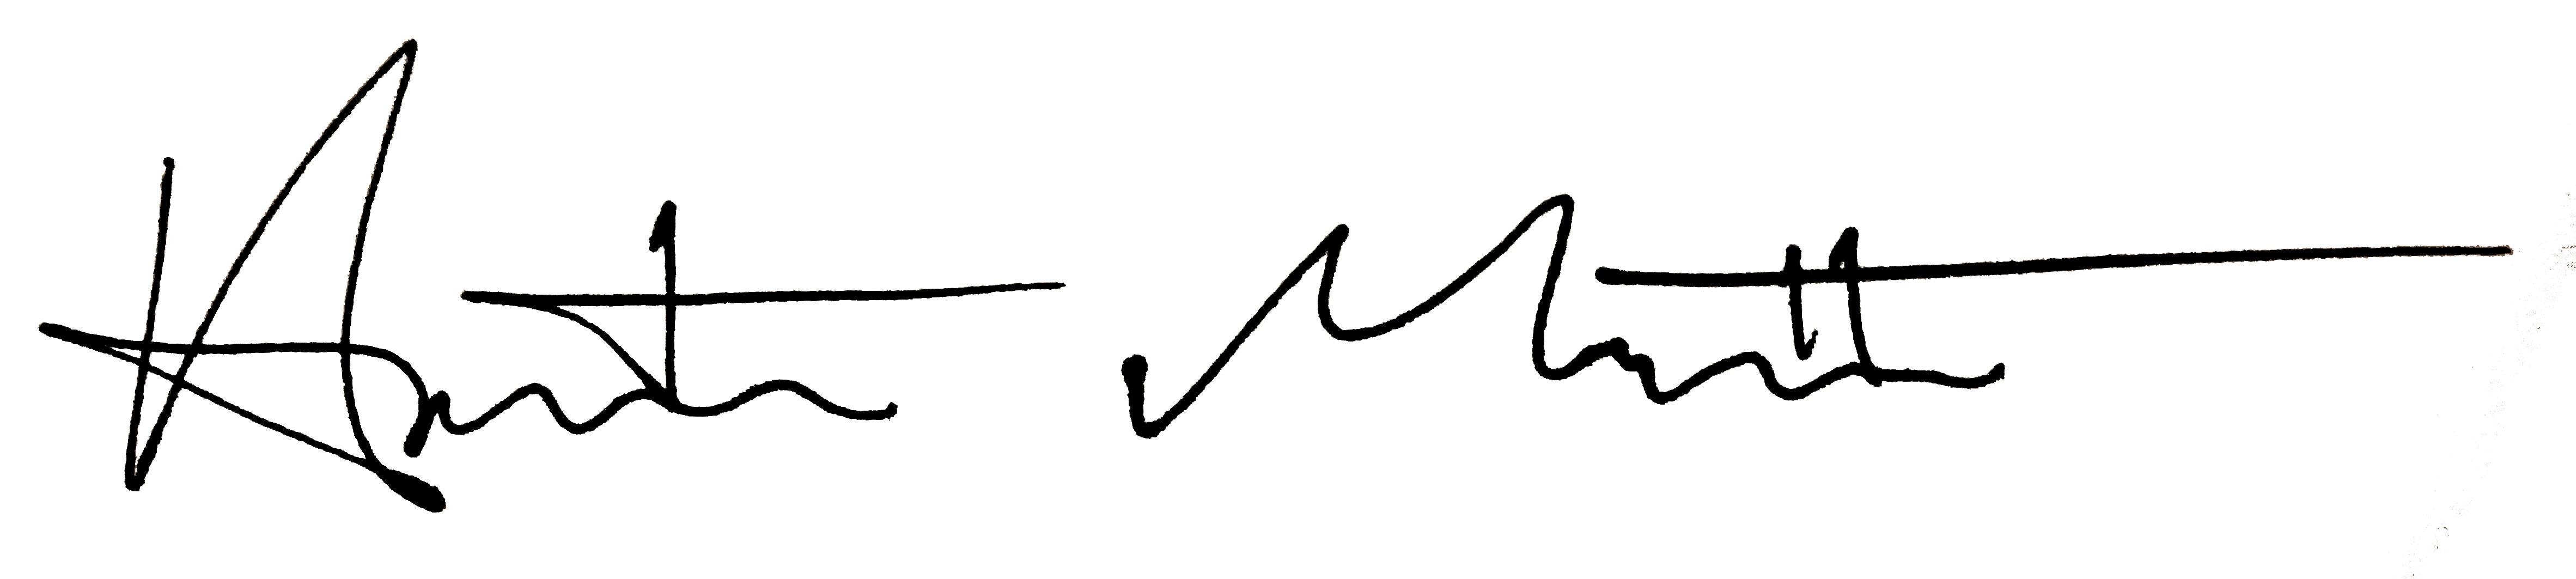 Austin Matthew Signature